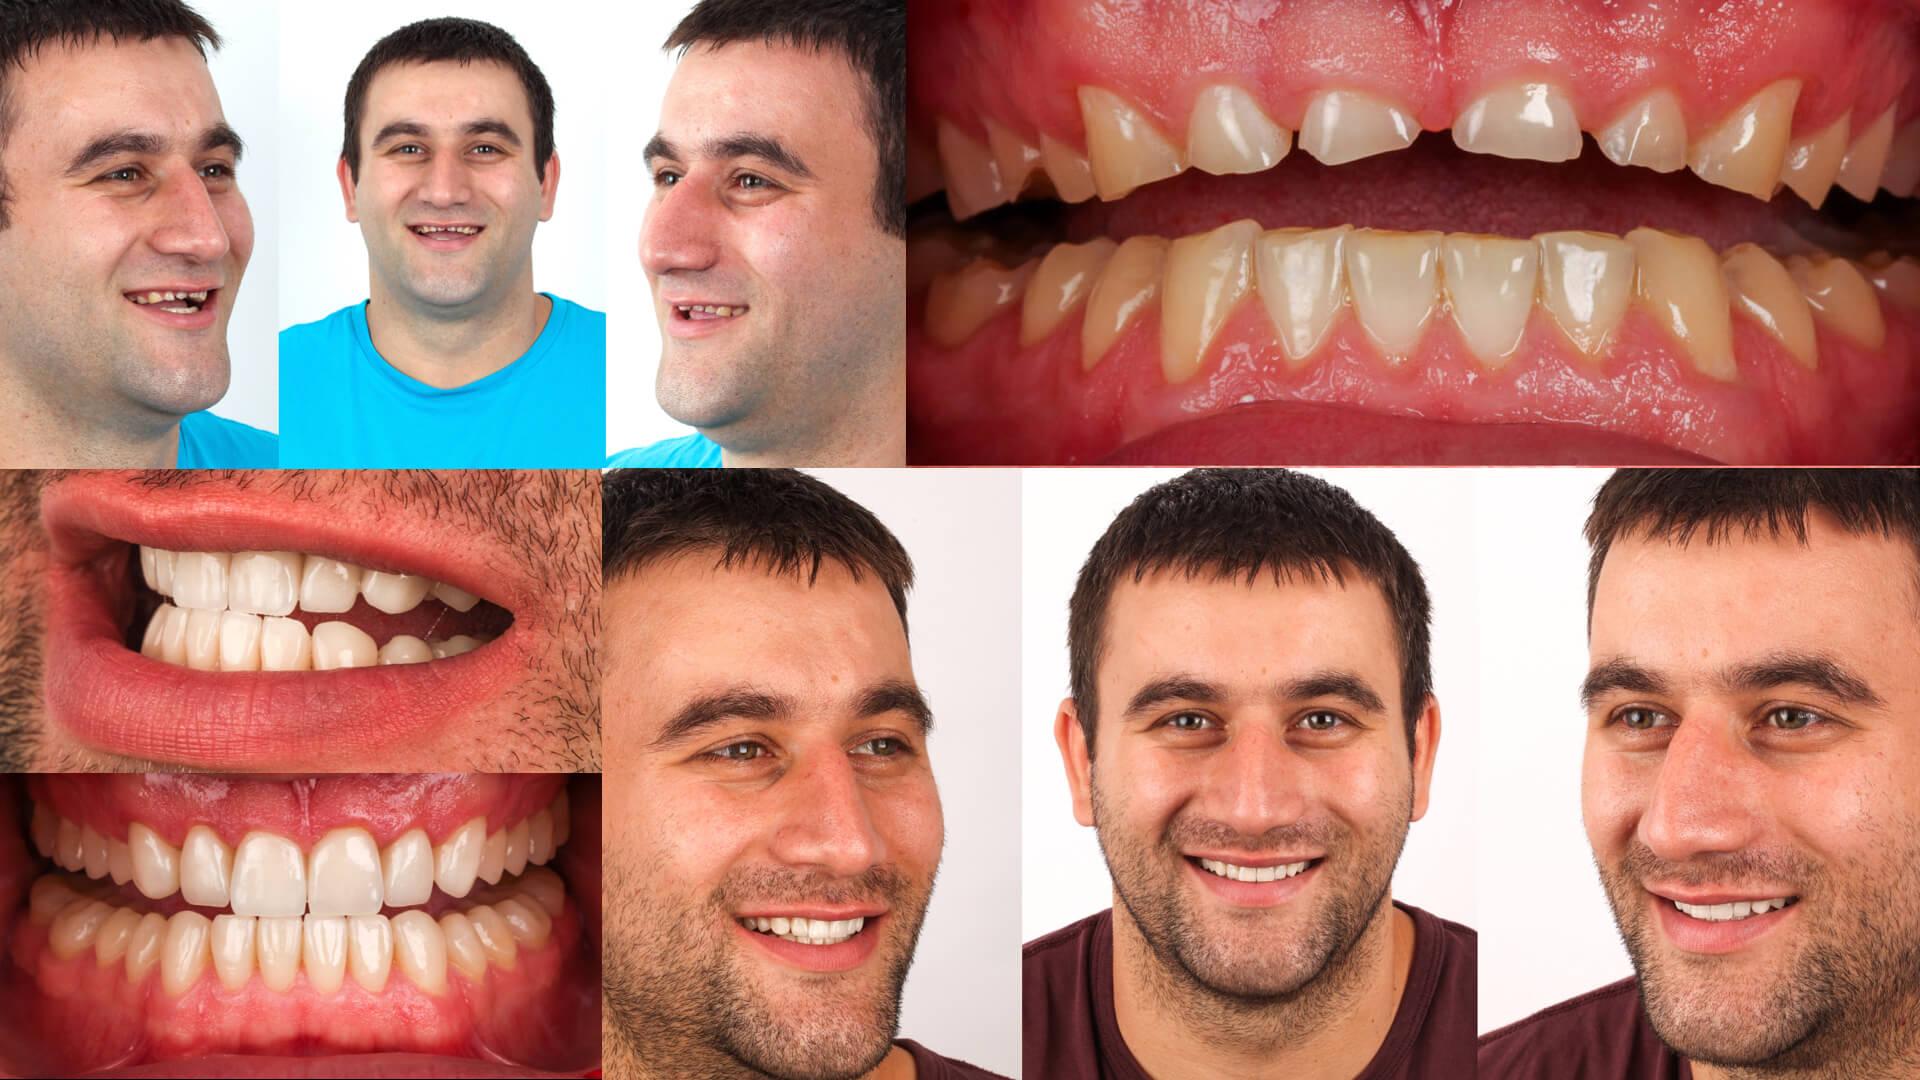 Prosthetic restoration in aesthetic Dentistry: winner case n°2 from Aiop International Prosthodontic Contest 2014